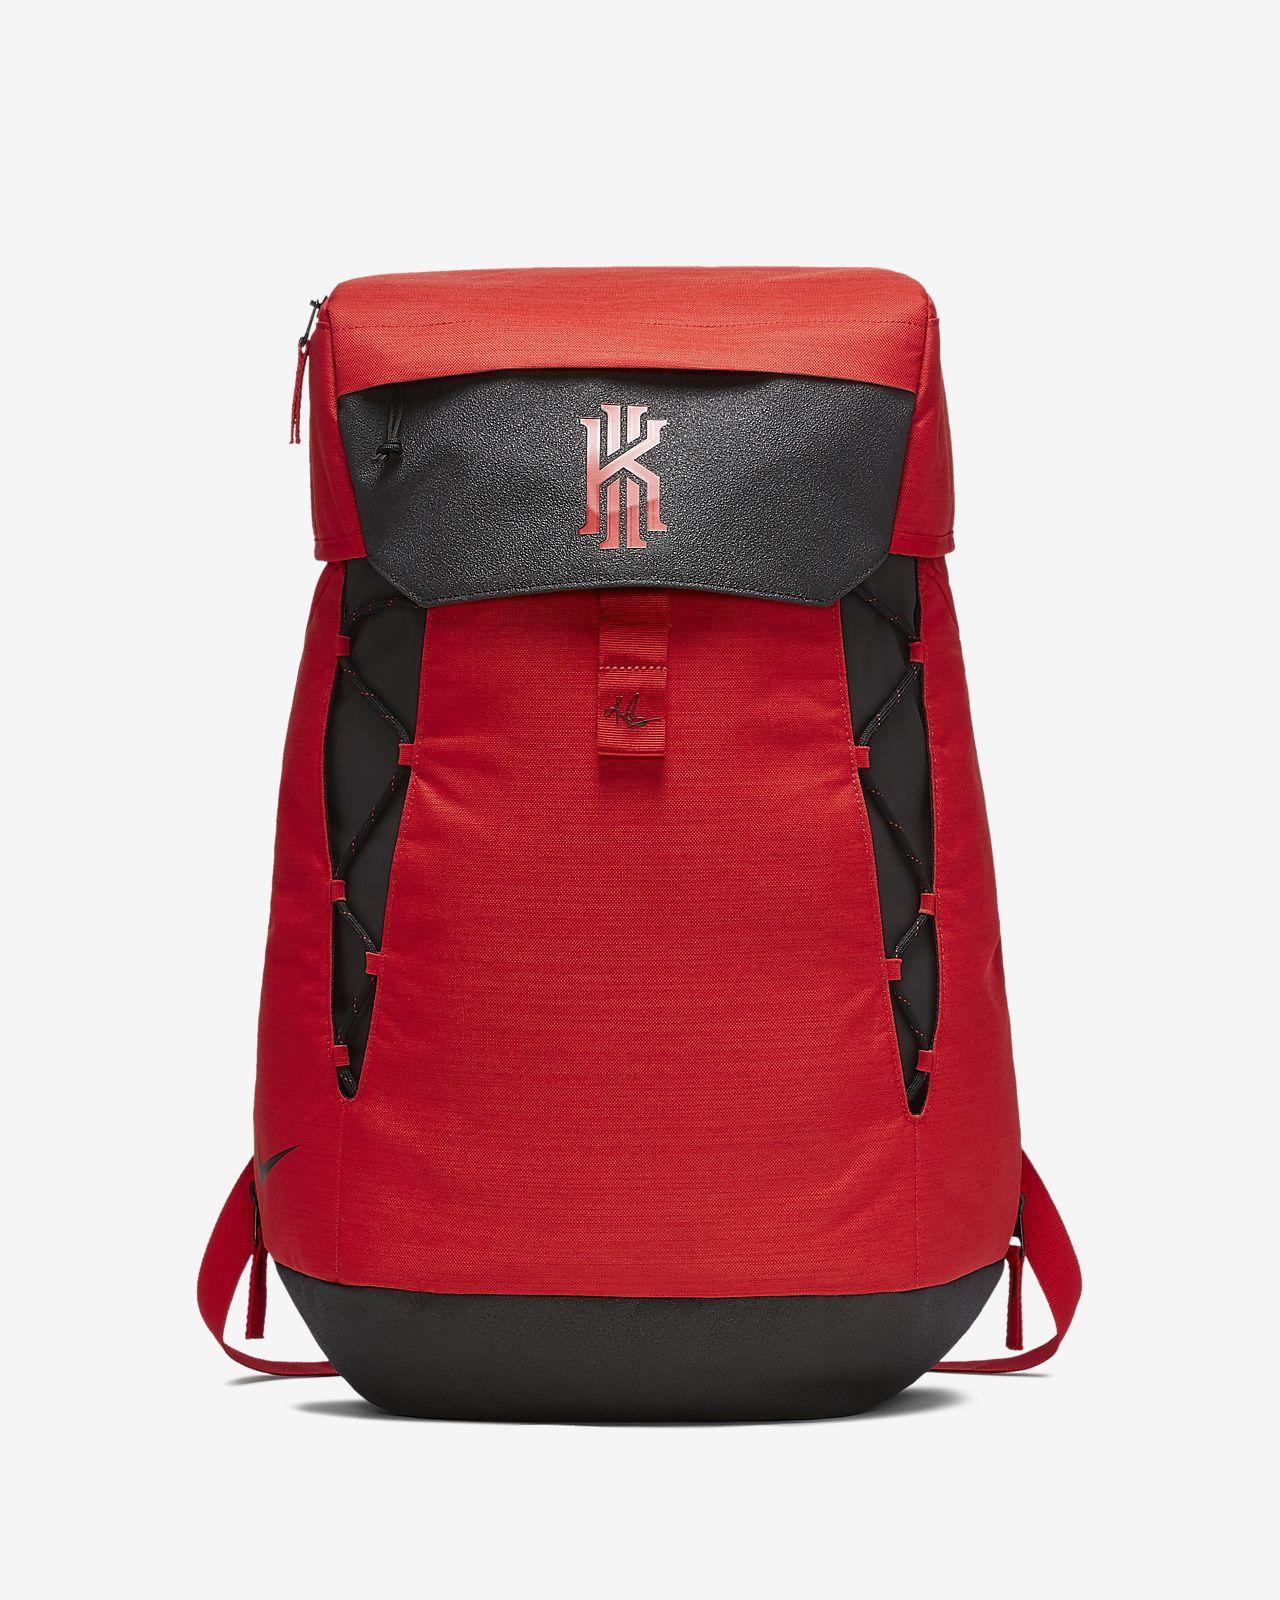 Automatización satisfacción Mediana  Kyrie Backpack. Nike.com | Backpacks, Backpack brands, Nike kyrie